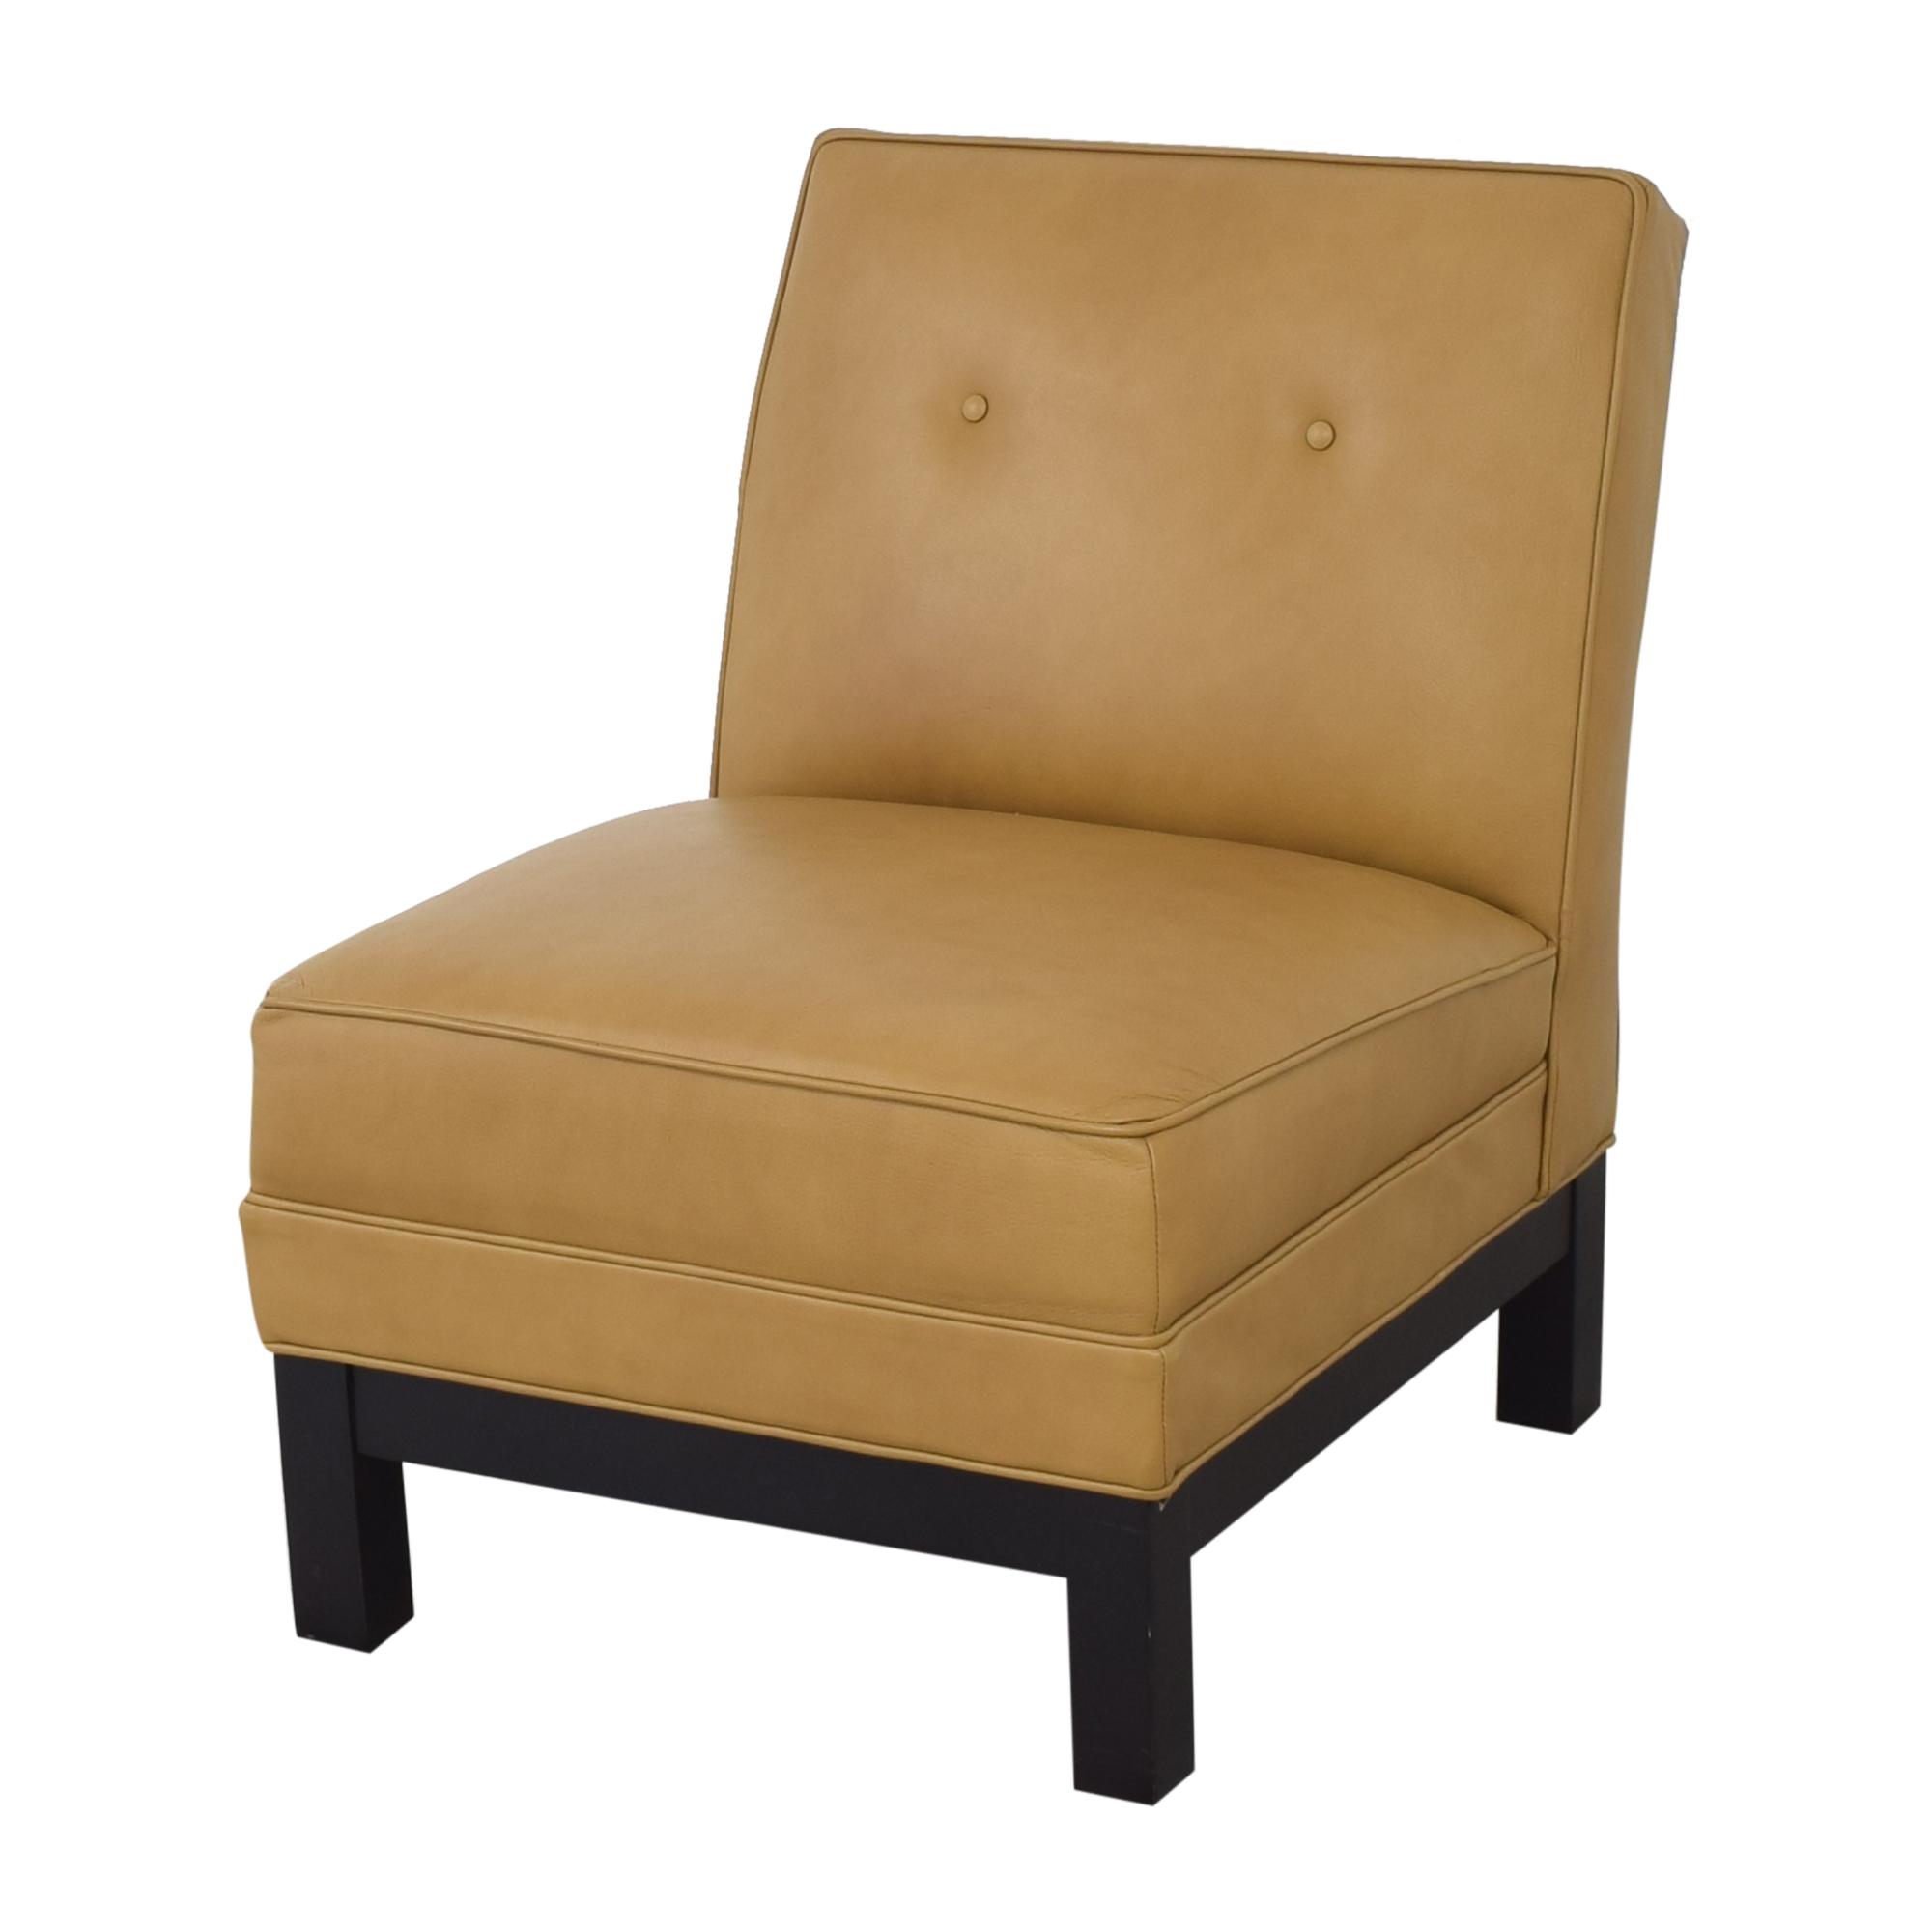 shop Mitchell Gold + Bob Williams Mitchell Gold + Bob Williams Liana Chair online